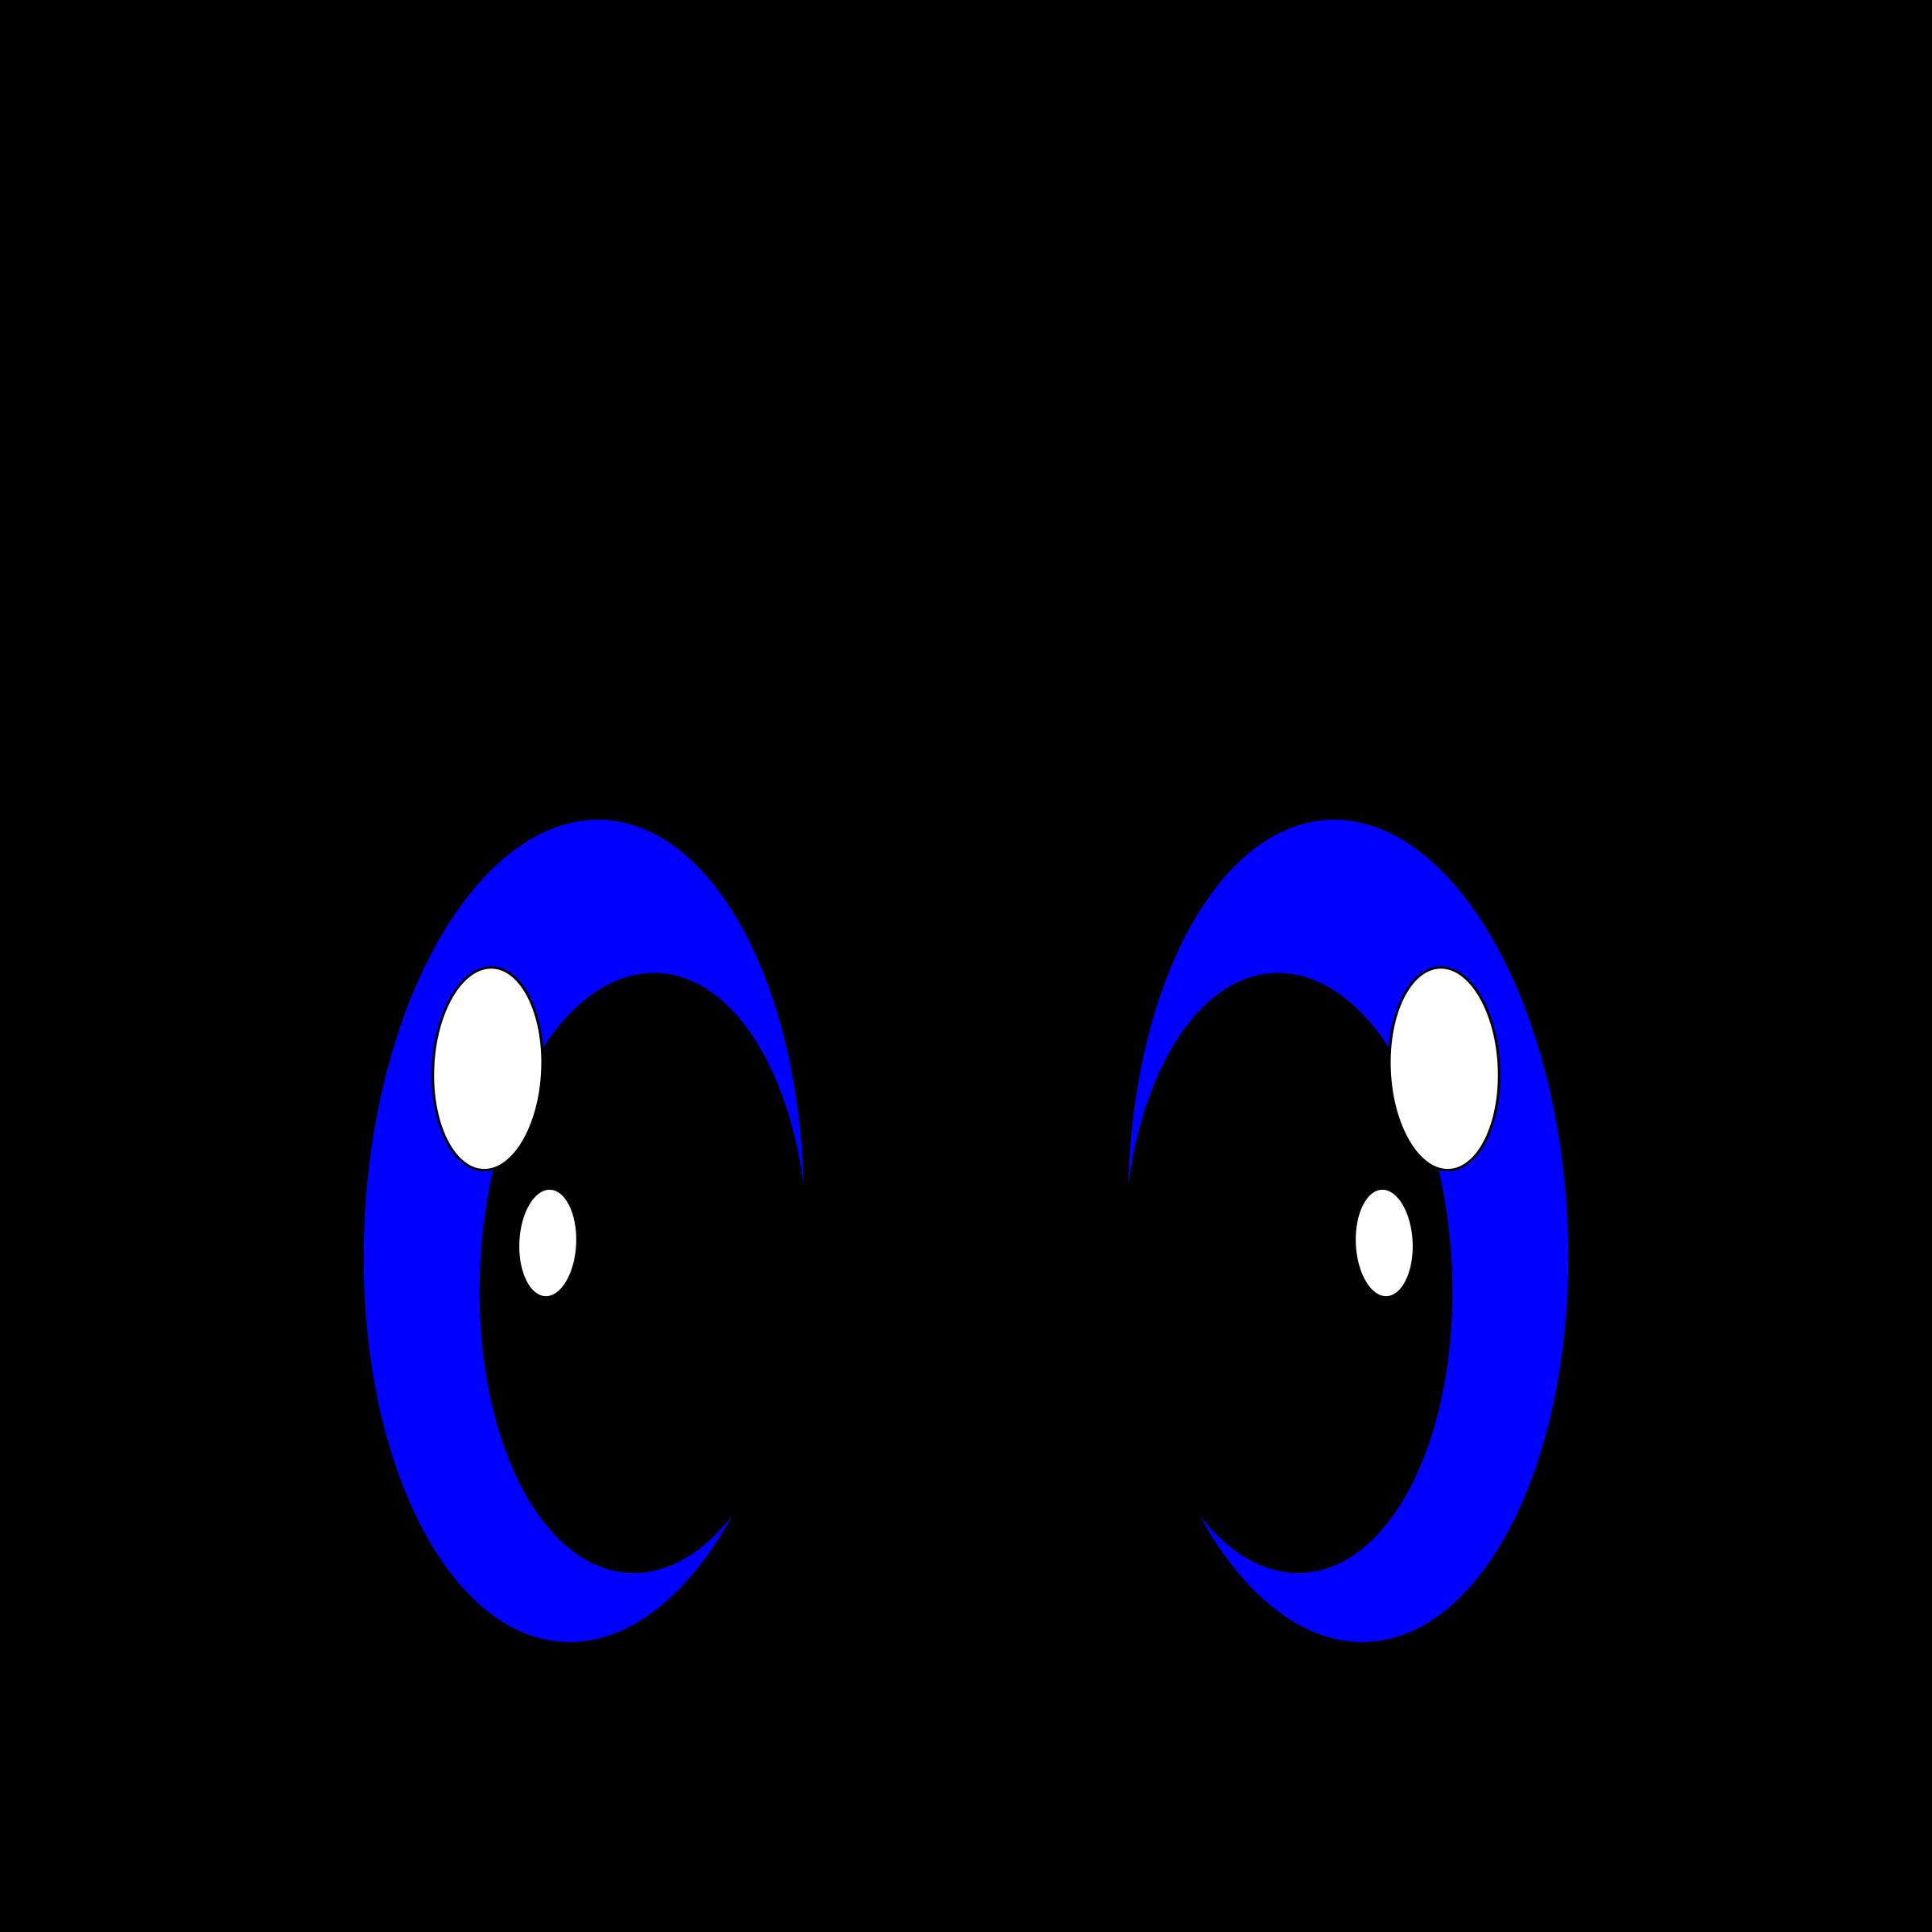 Free reindeer eyes cliparts. Eyeball clipart large